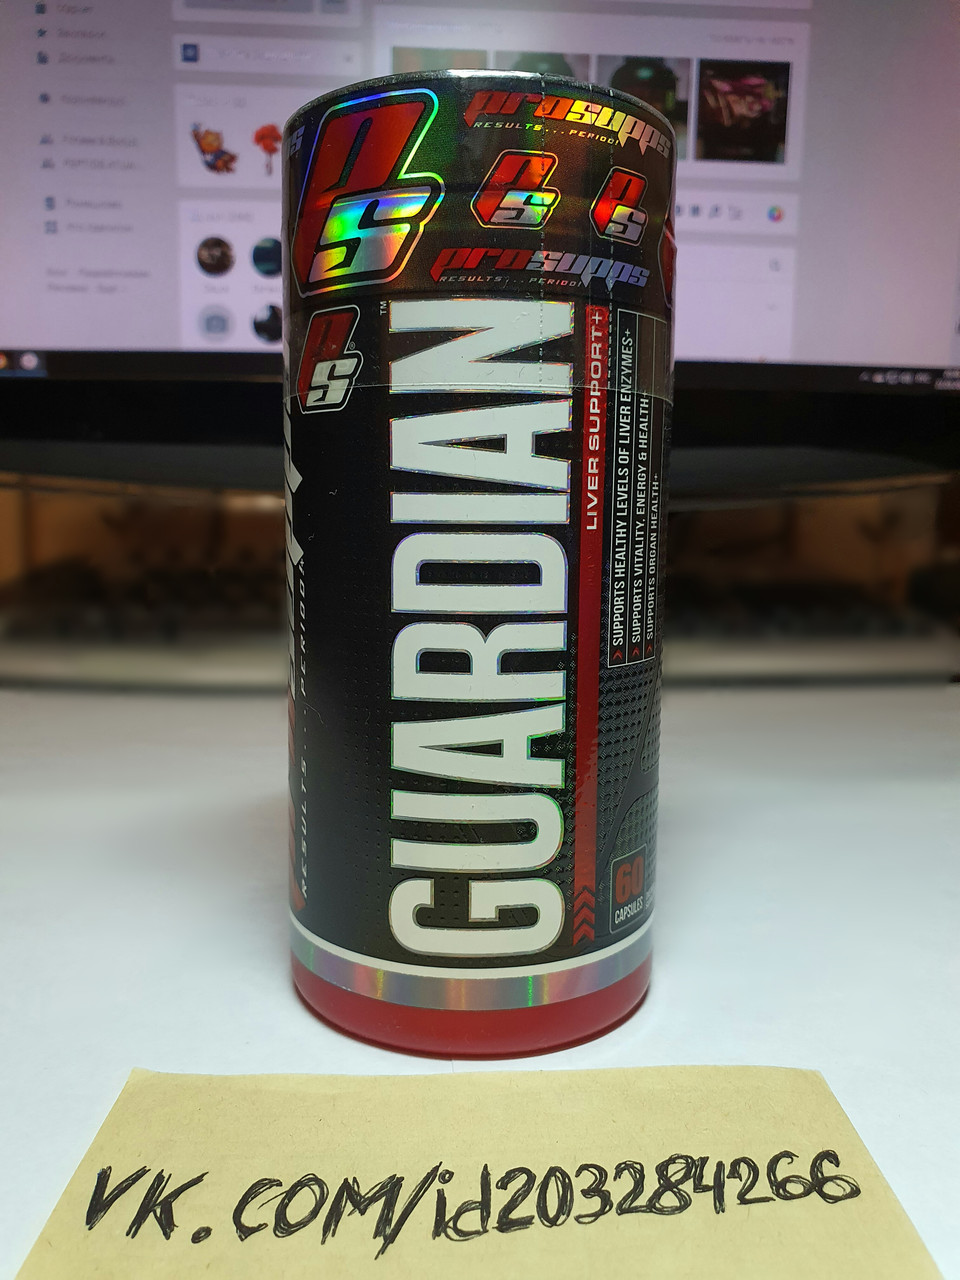 Препарат для поддержания детоксикации печени Pro Supps Guardian 60 caps гепатопротектор